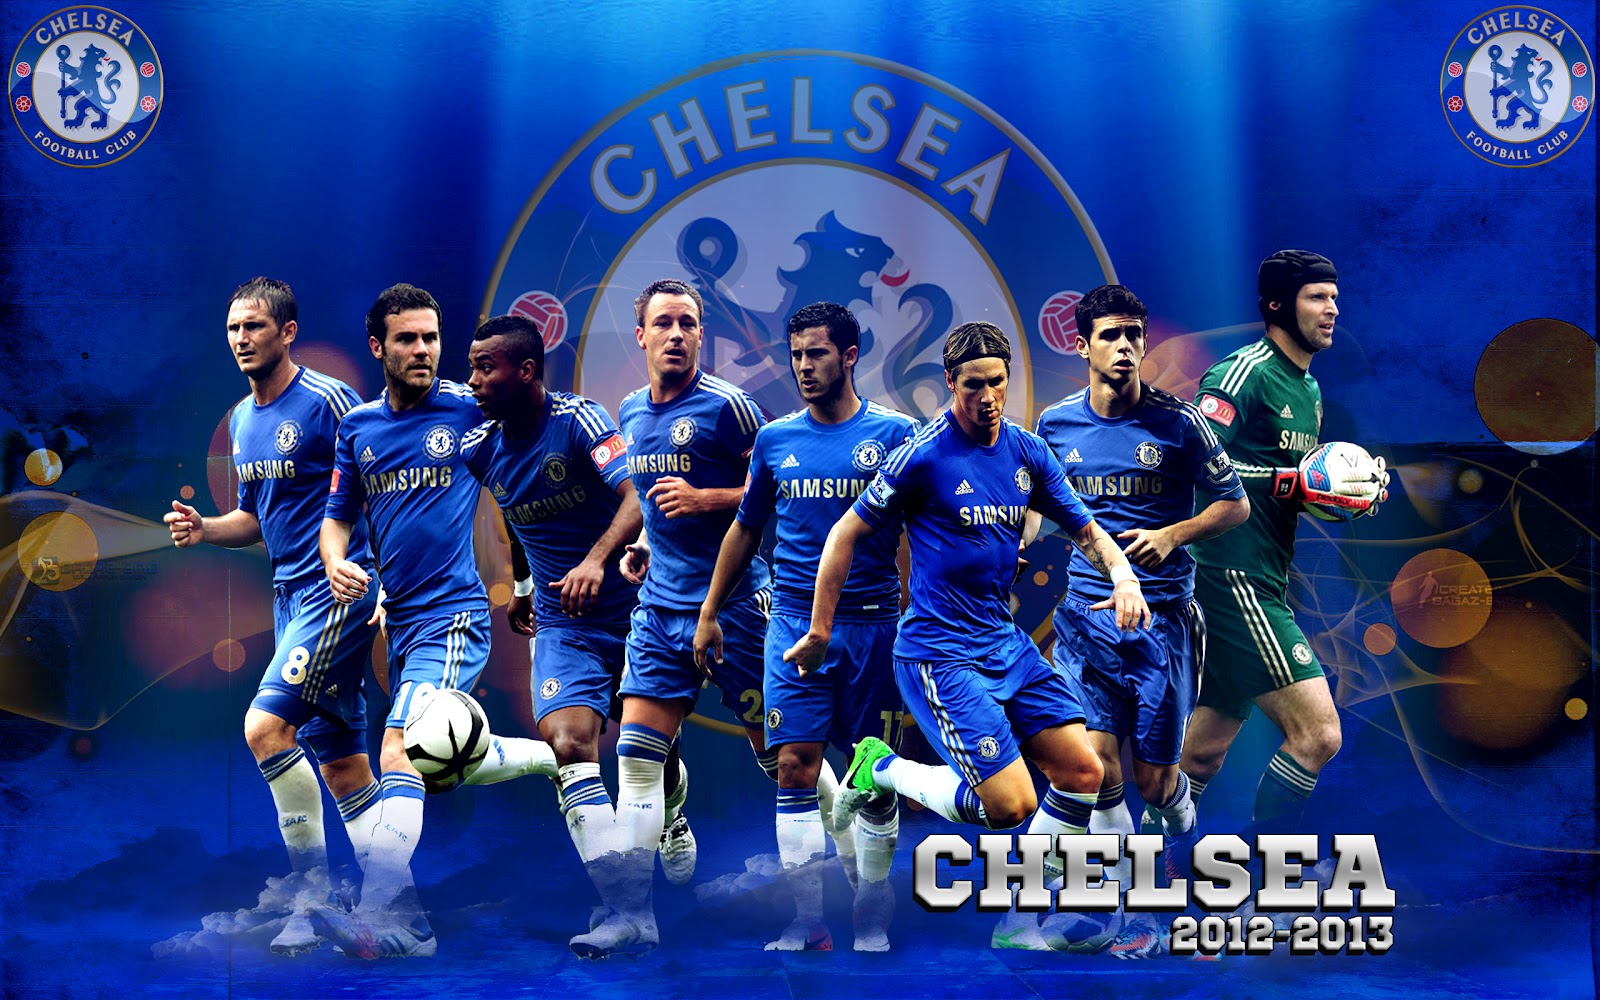 Chelsea Wallpaper 2015 11362 Wallpaper Cool Walldiskpapercom 1600x1000